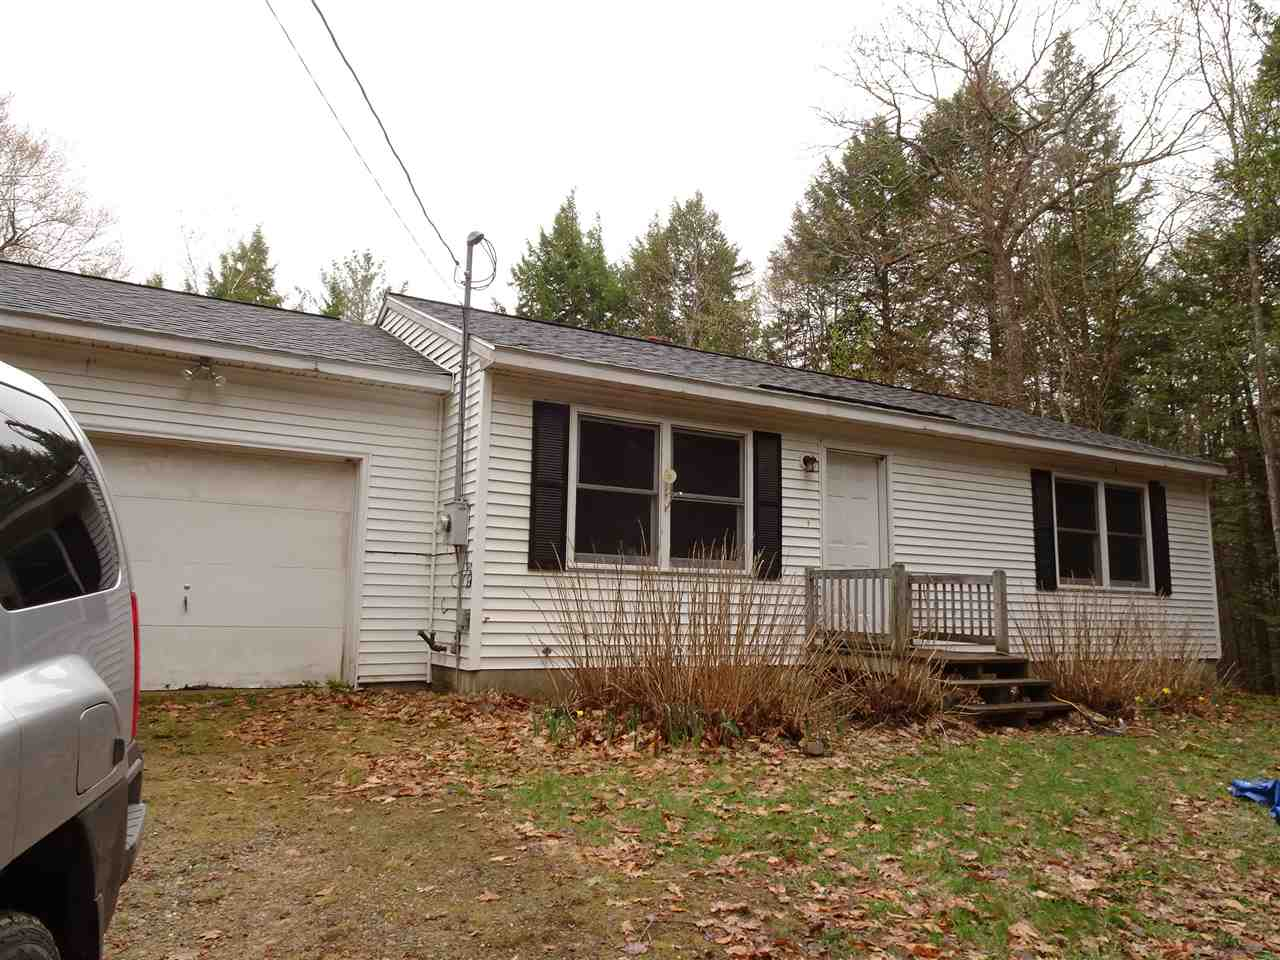 SANBORNTON NH Home for sale $159,900